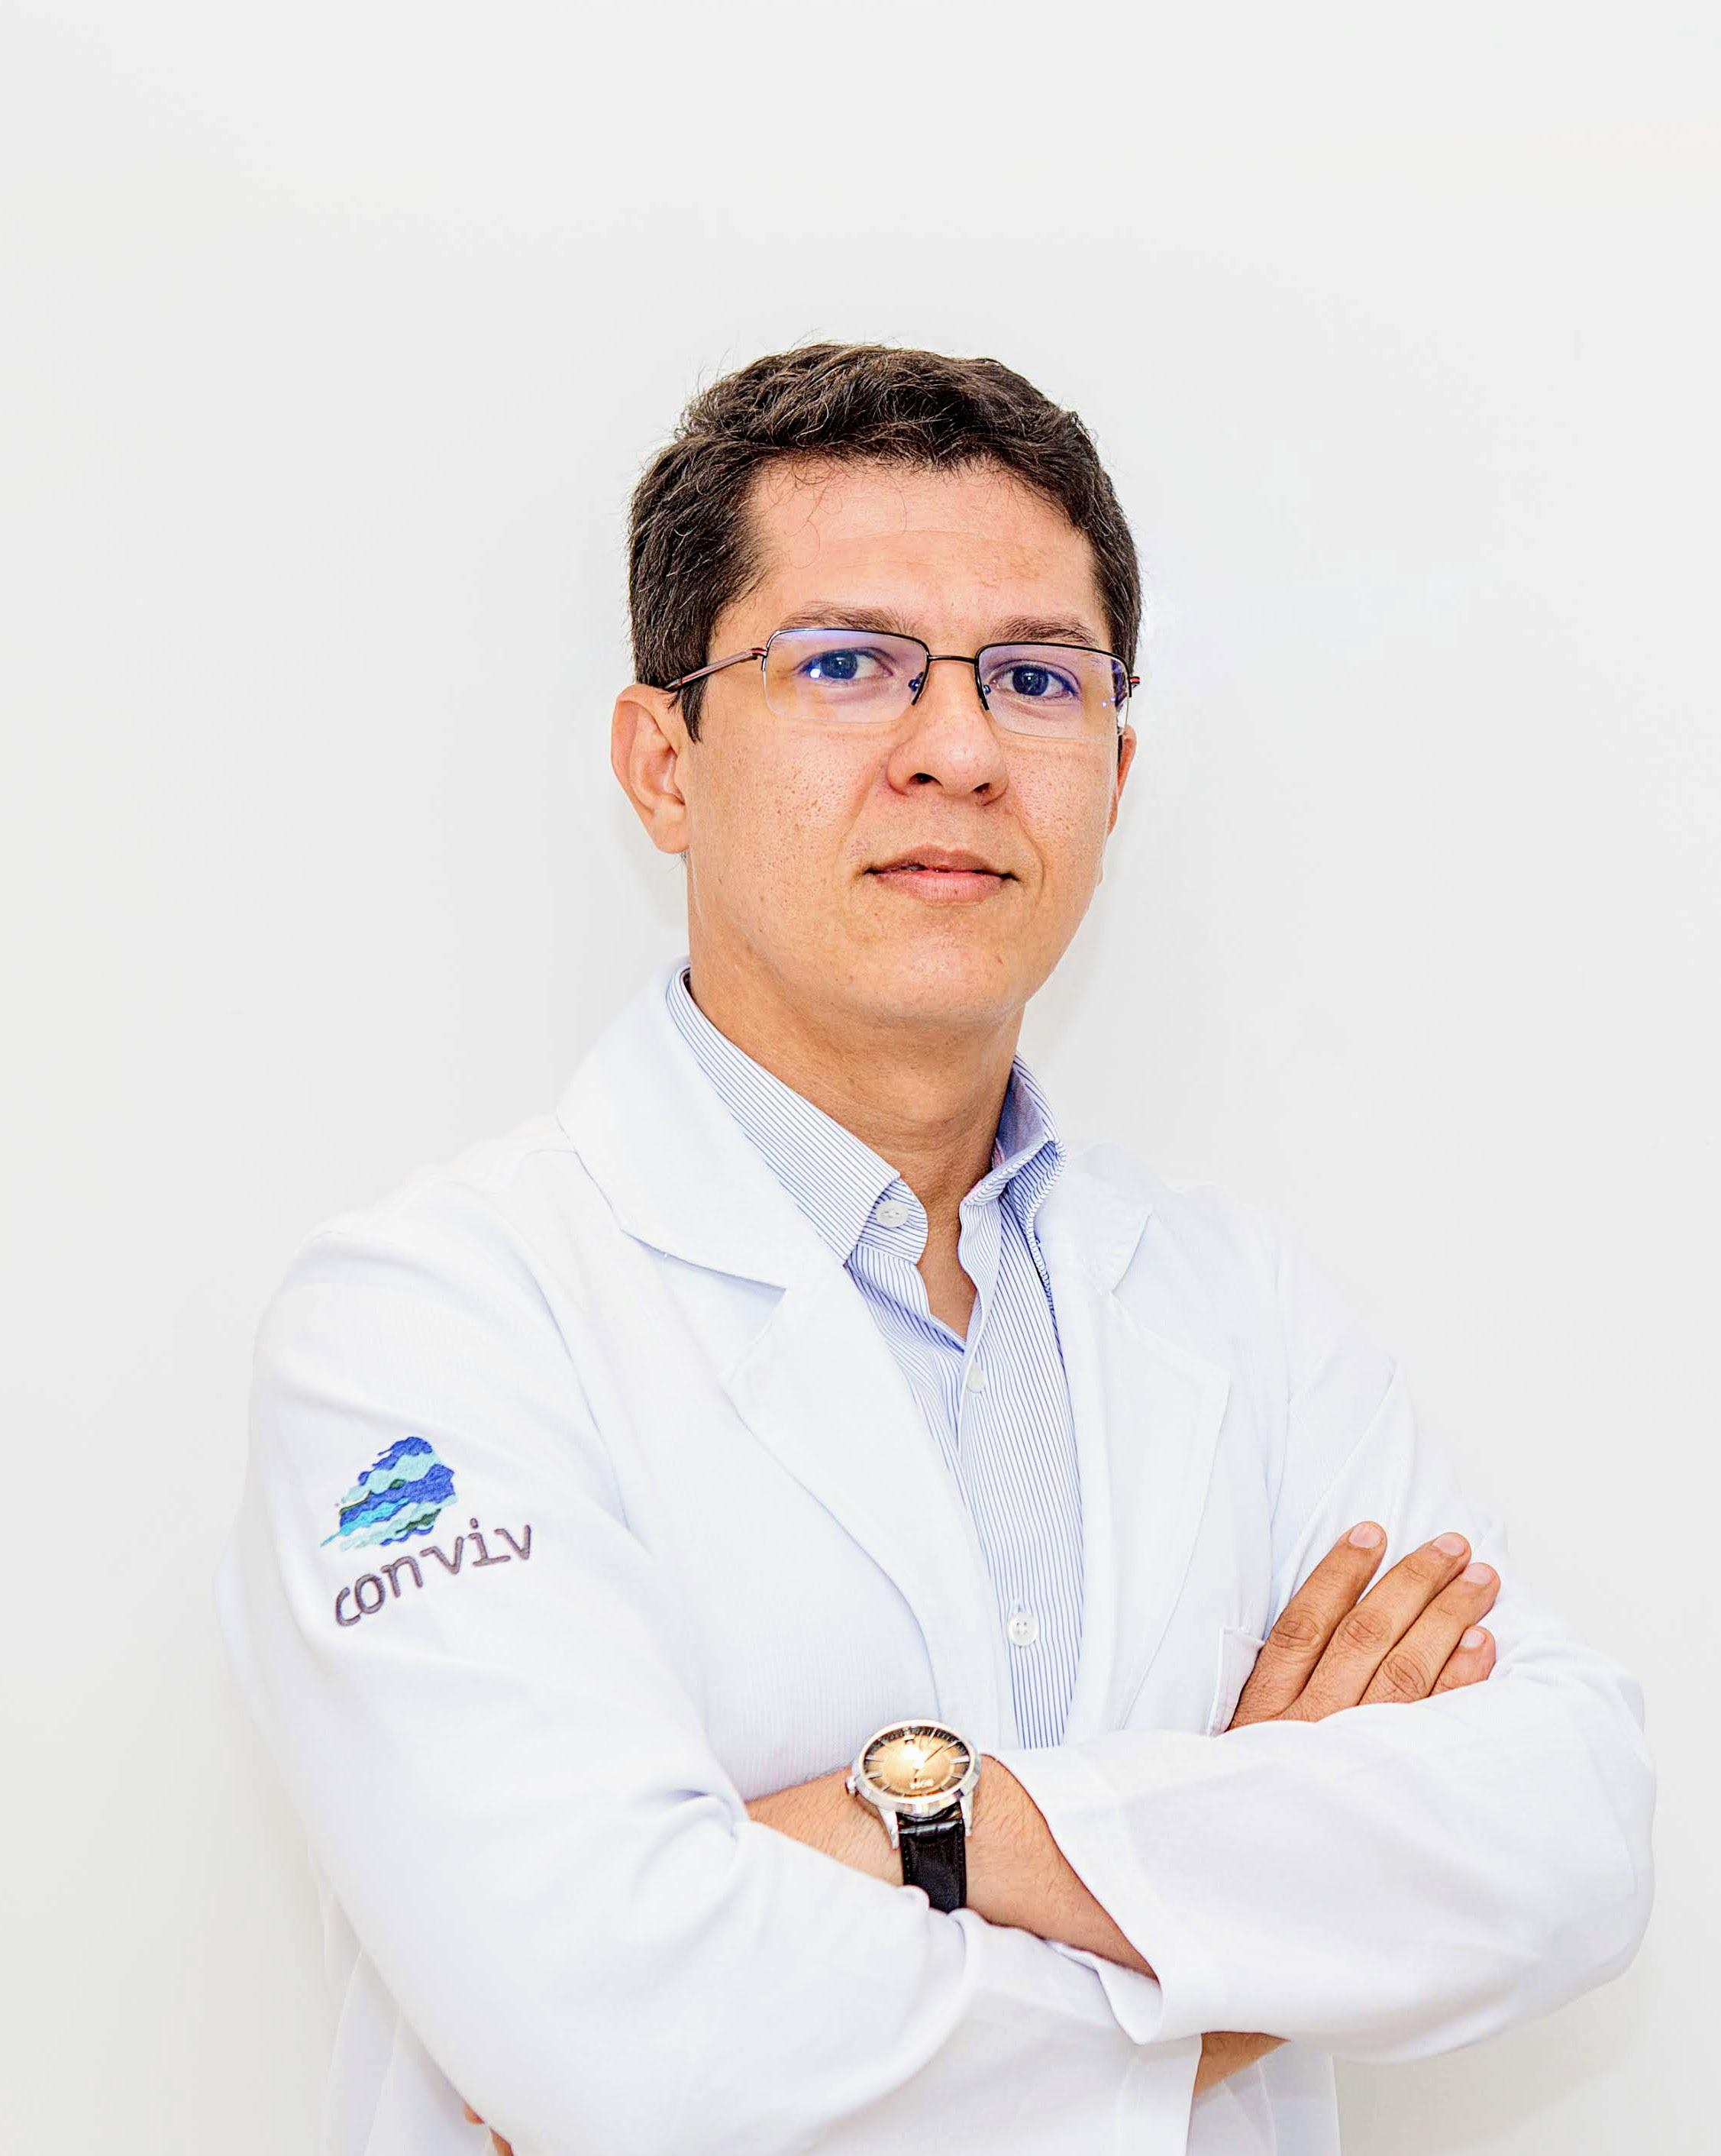 Antonio Alexandre Leite Mendonça Miná